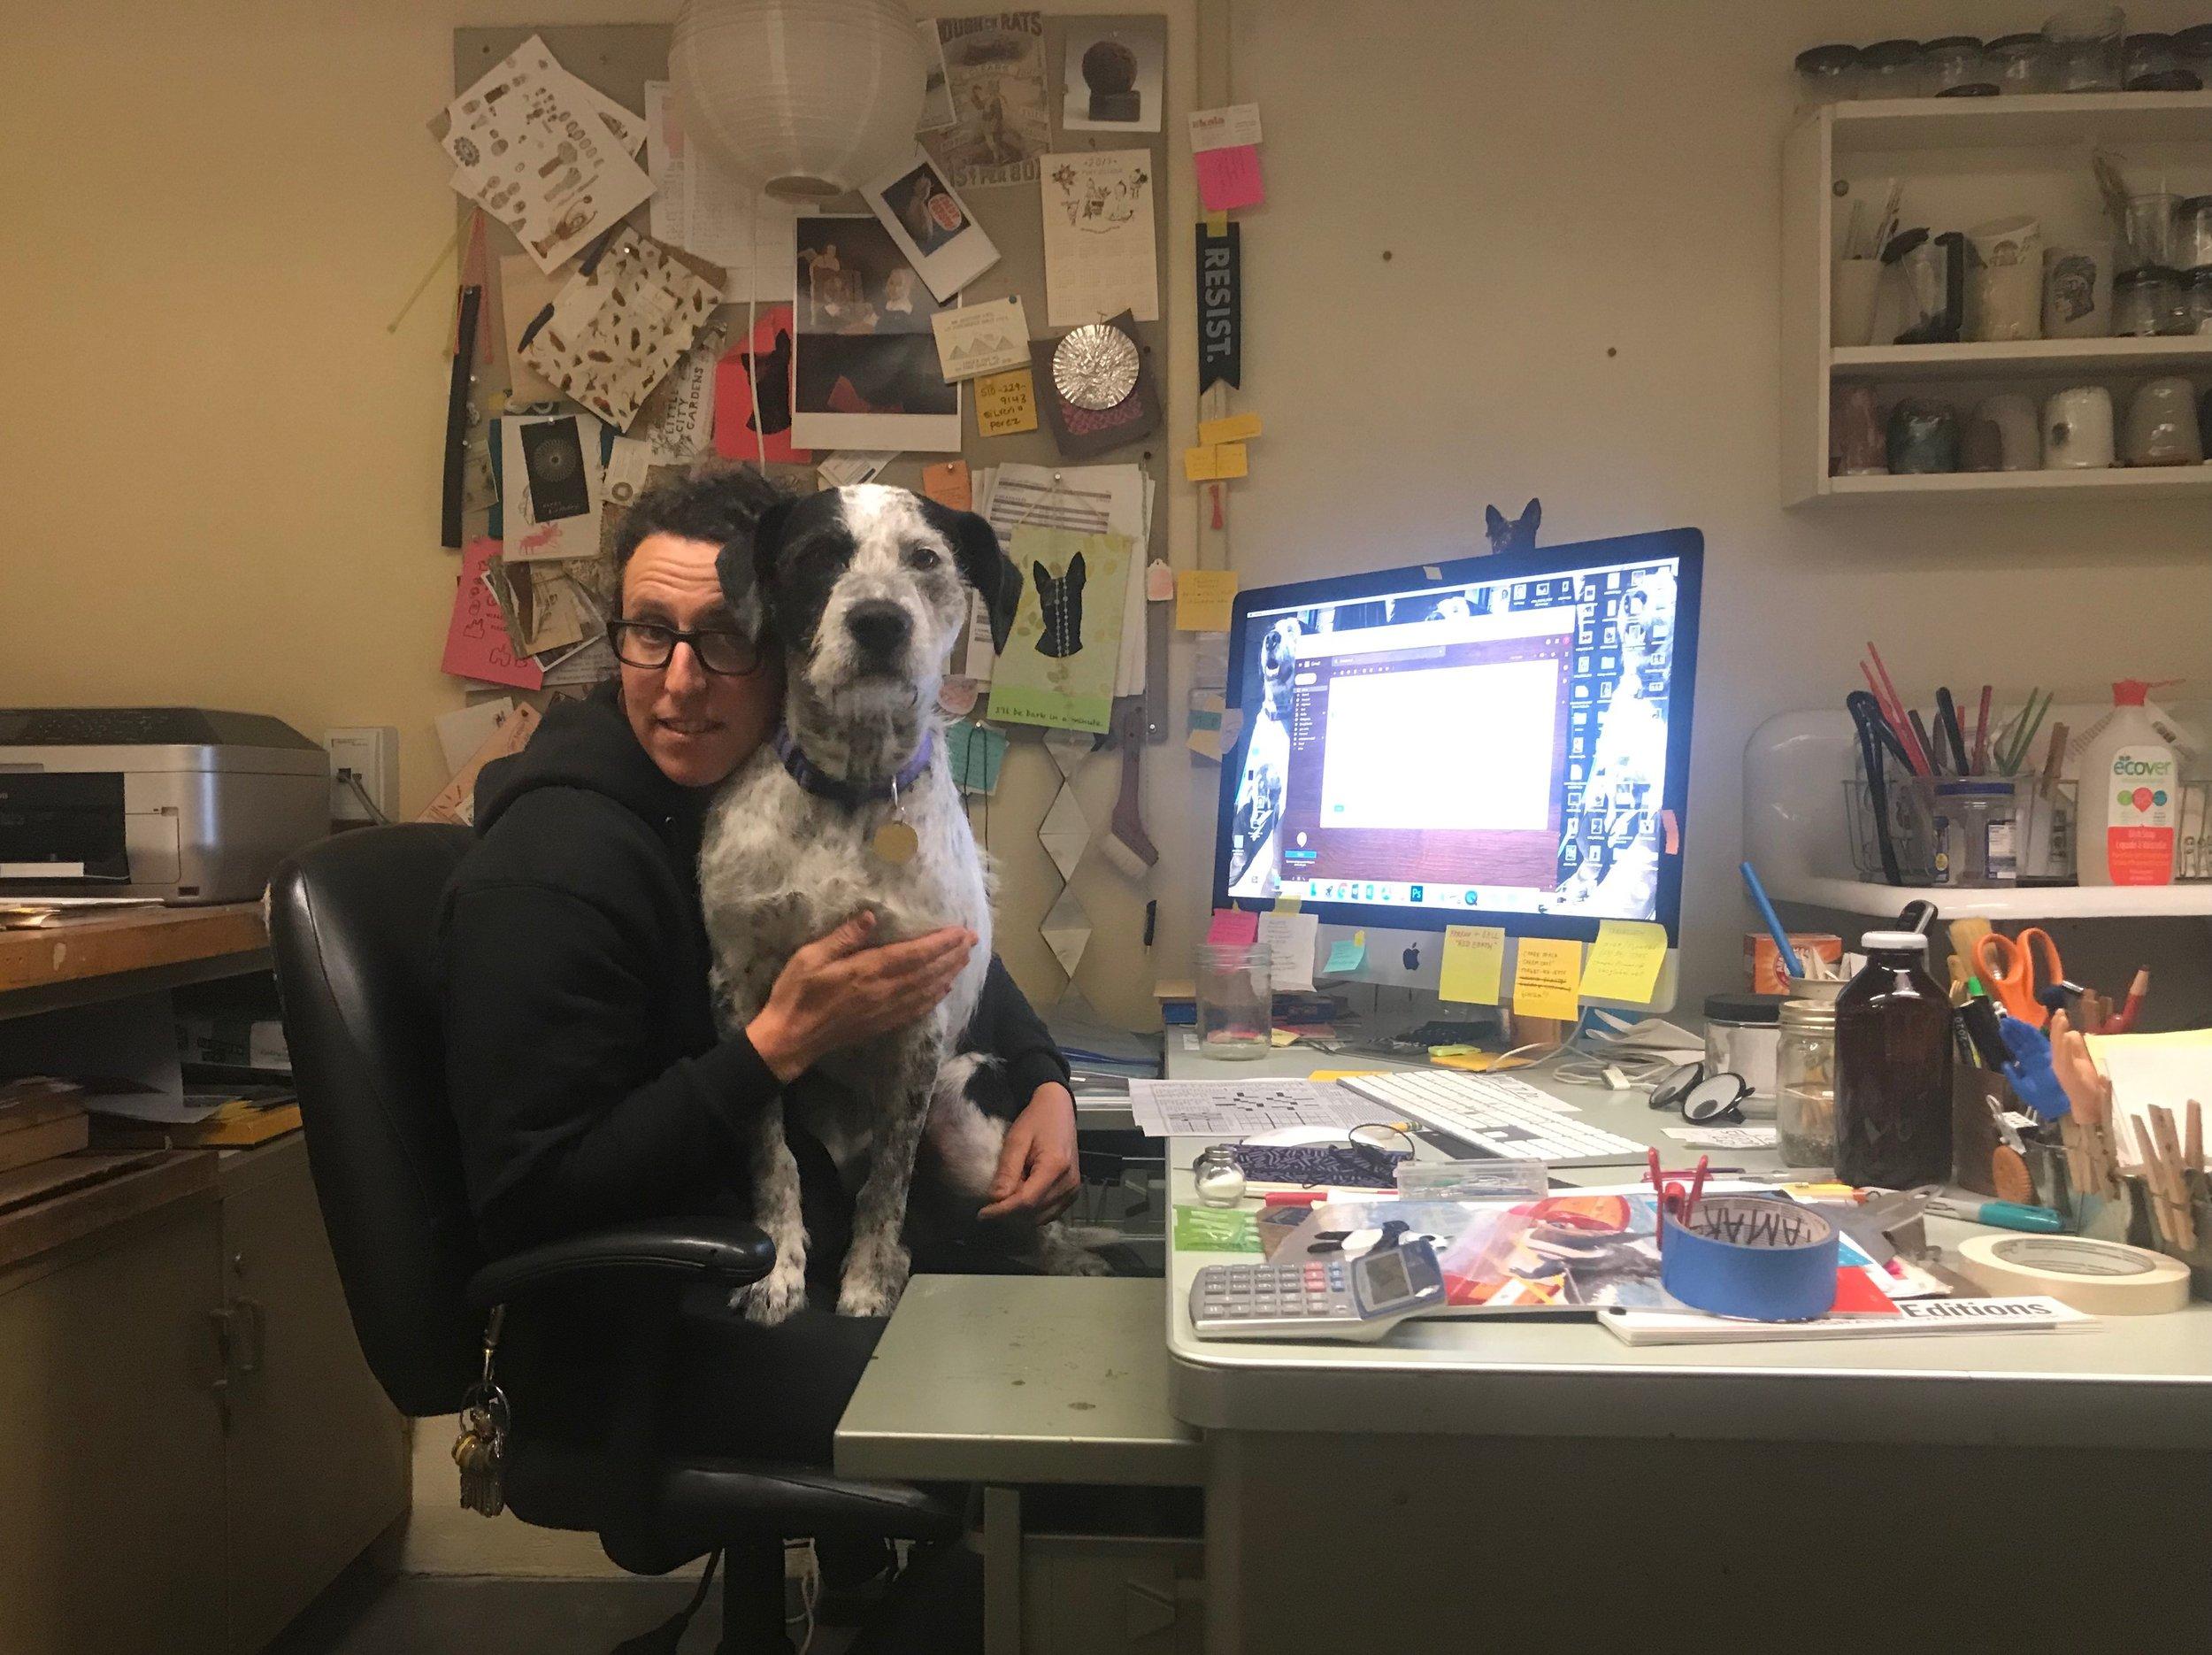 Tamar Beja, Print Studio Technician